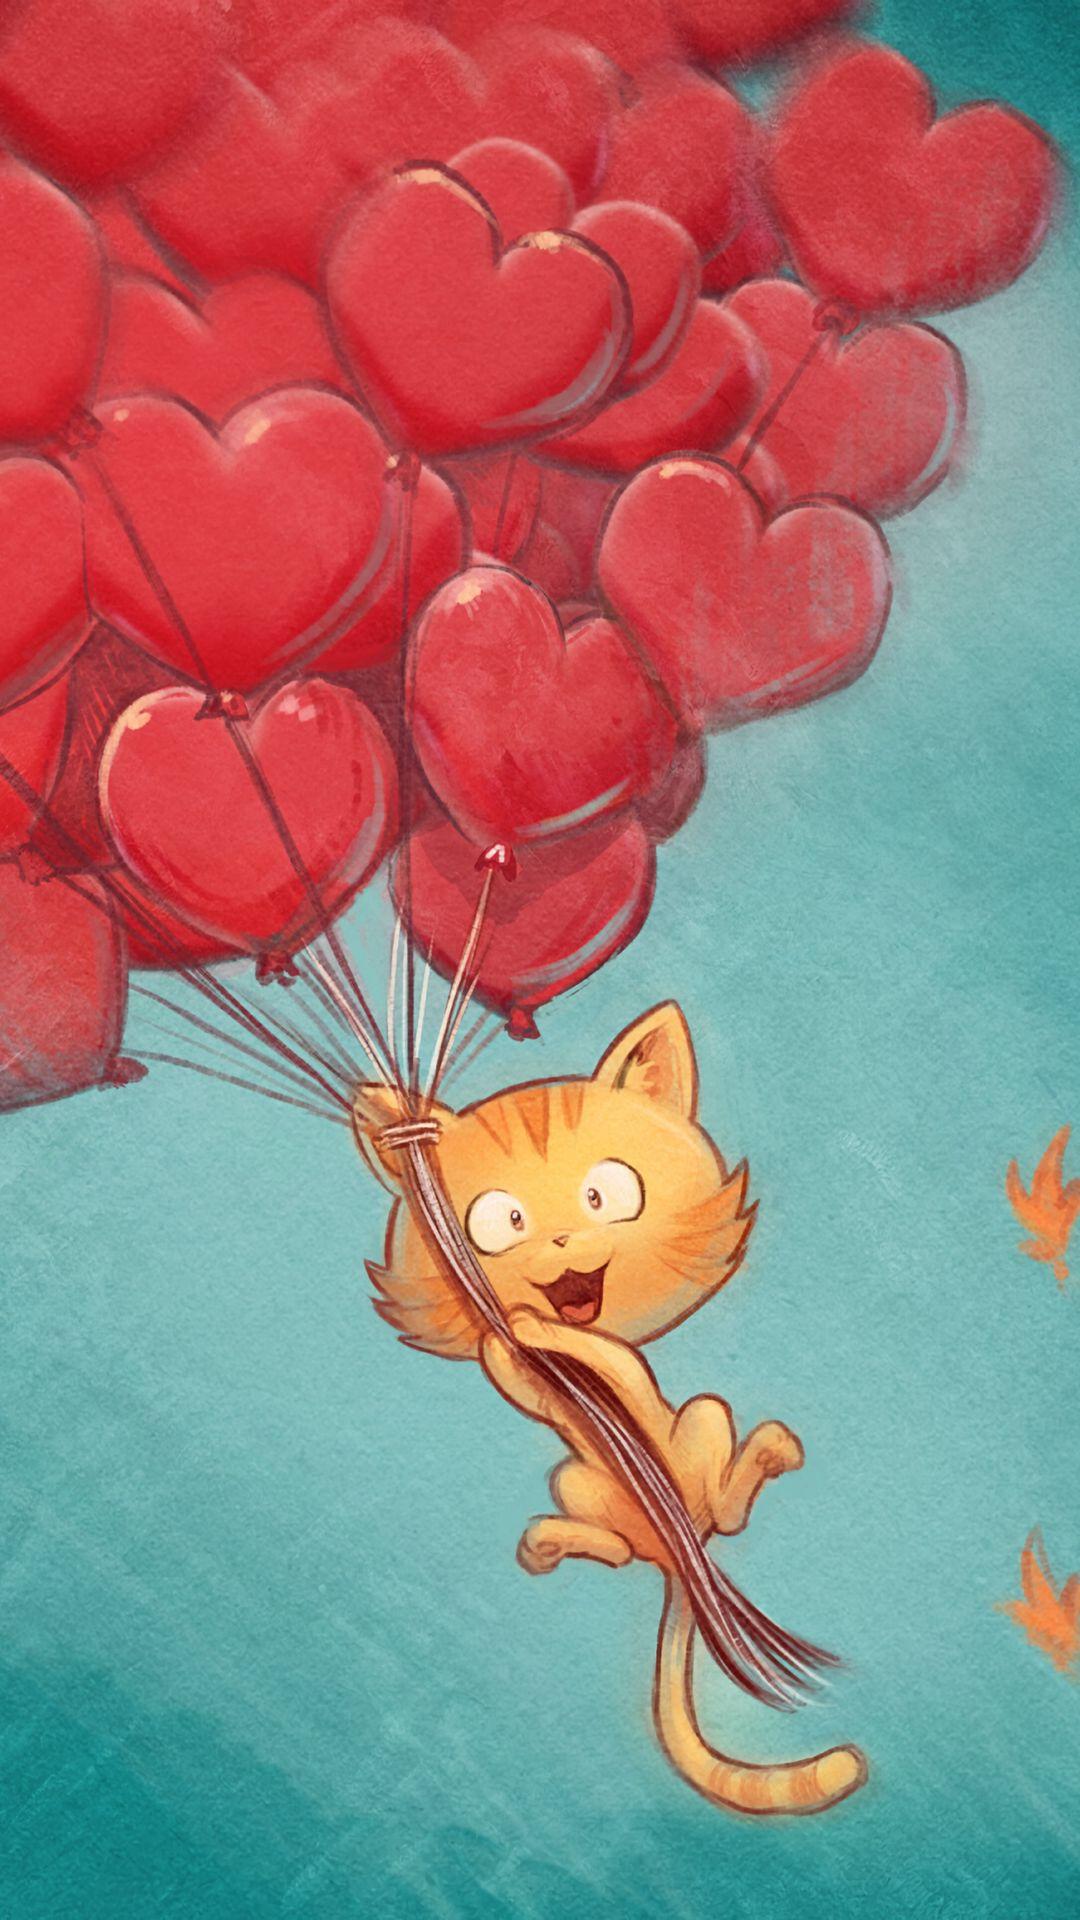 1080x1920 Wallpaper cat, balloons, hearts, flight, sky, art